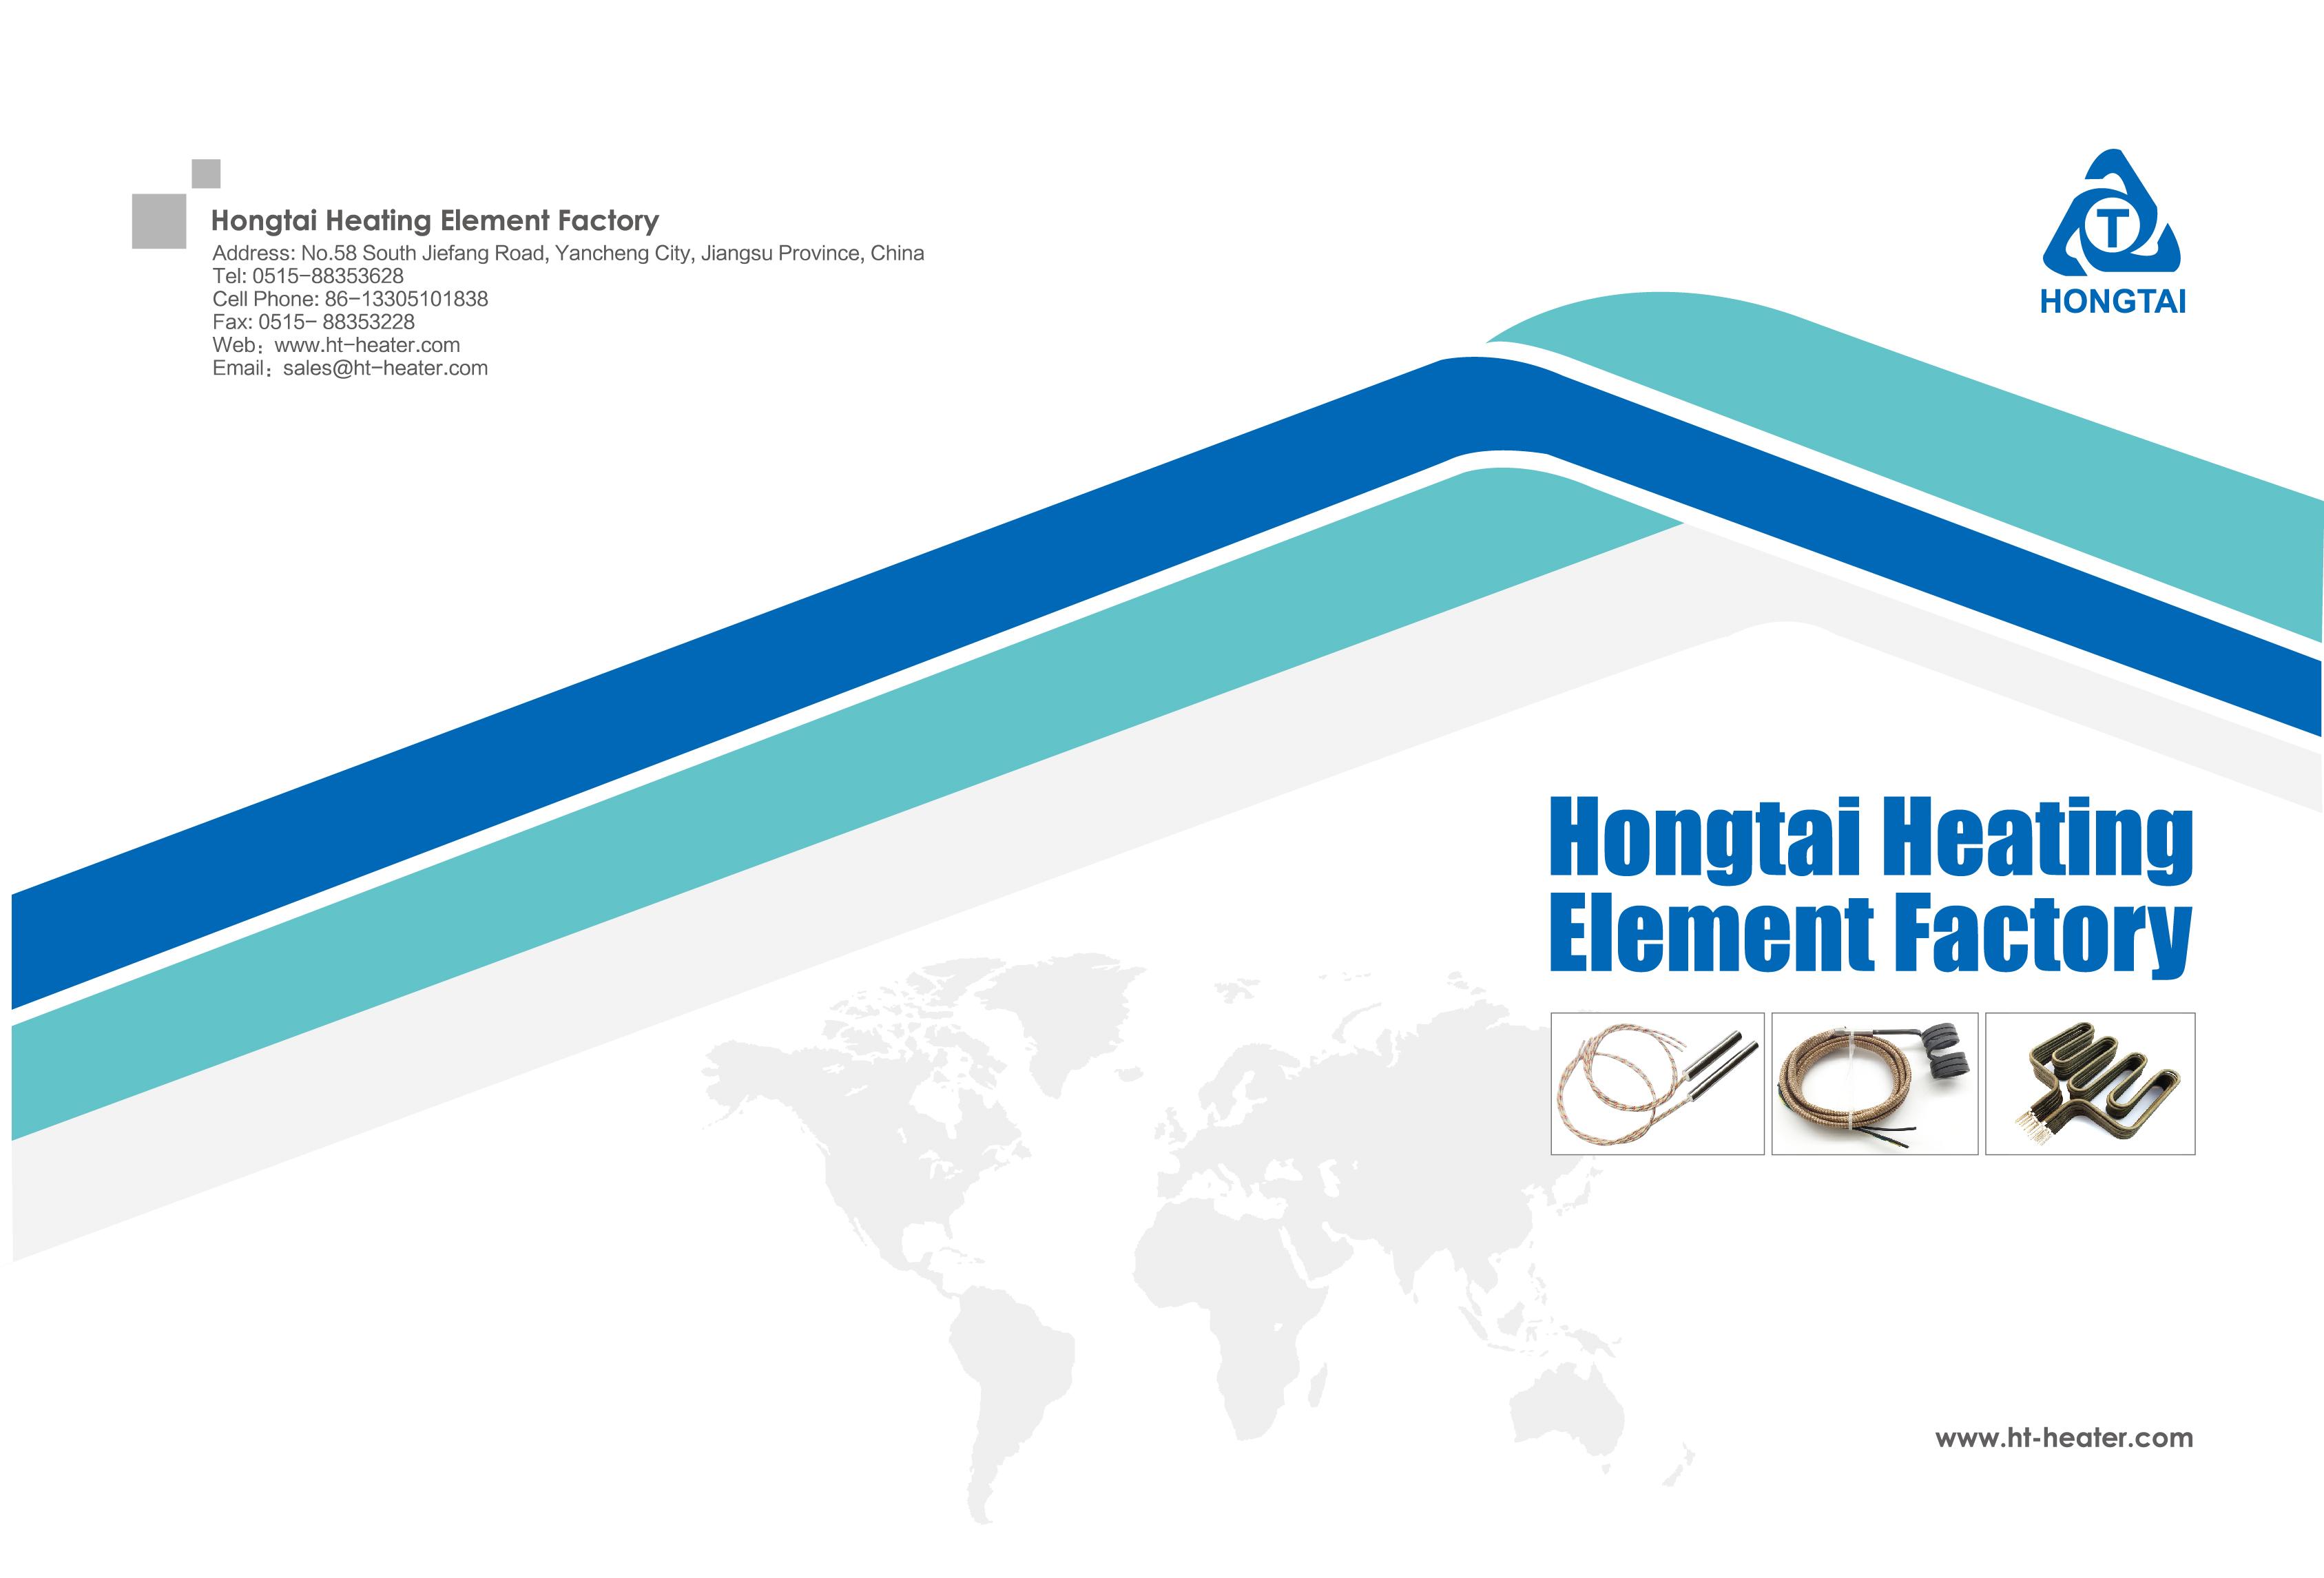 catalogue from Hongtai